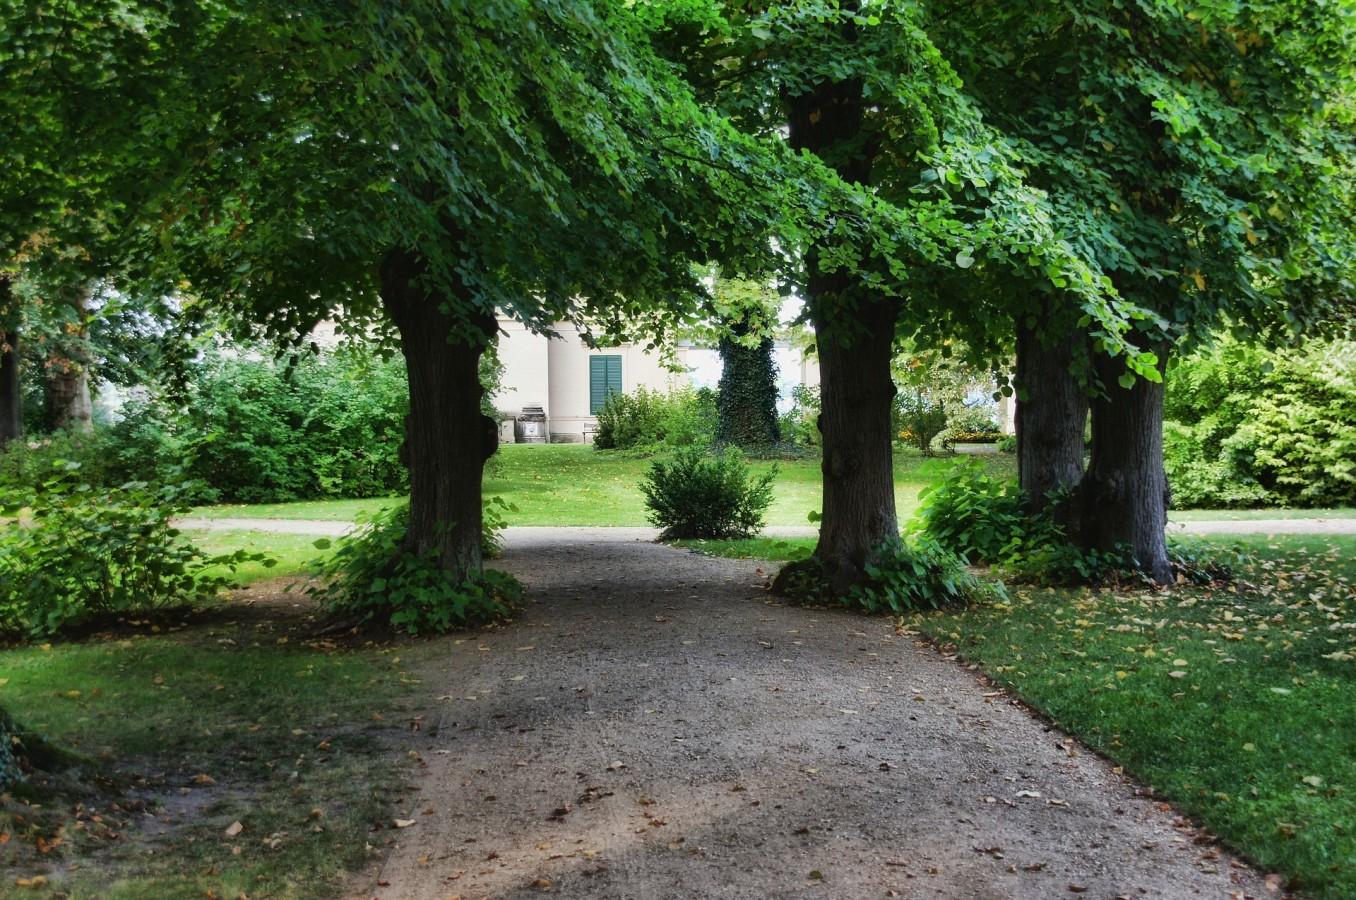 Nesm proj t pasivn klimatizace se postav teplu do cesty for Garden deciduous trees